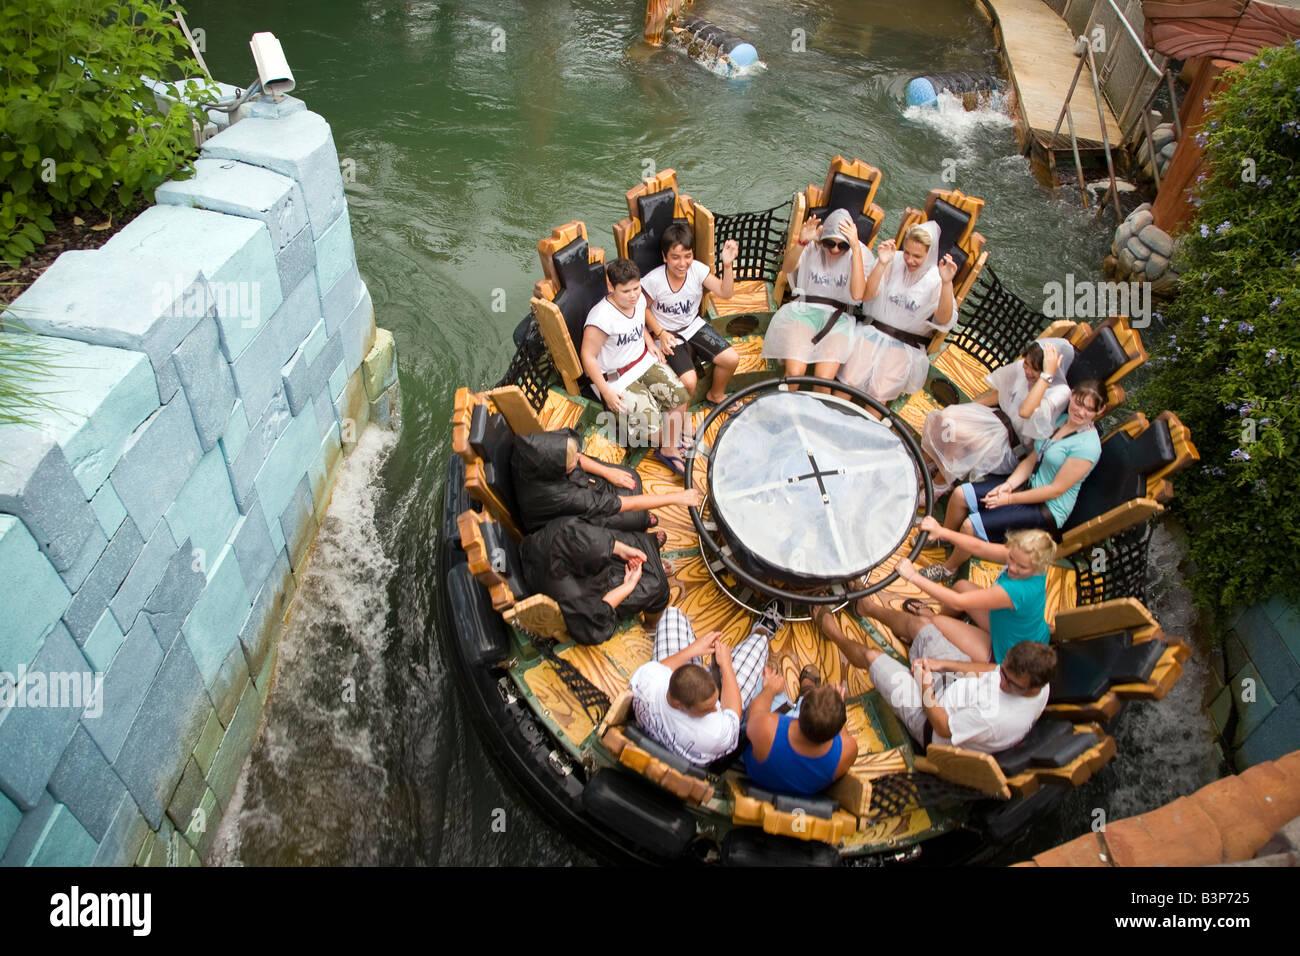 Tourists enjoying water rapids ride inside Universal Studios theme park Florida, USA - Stock Image